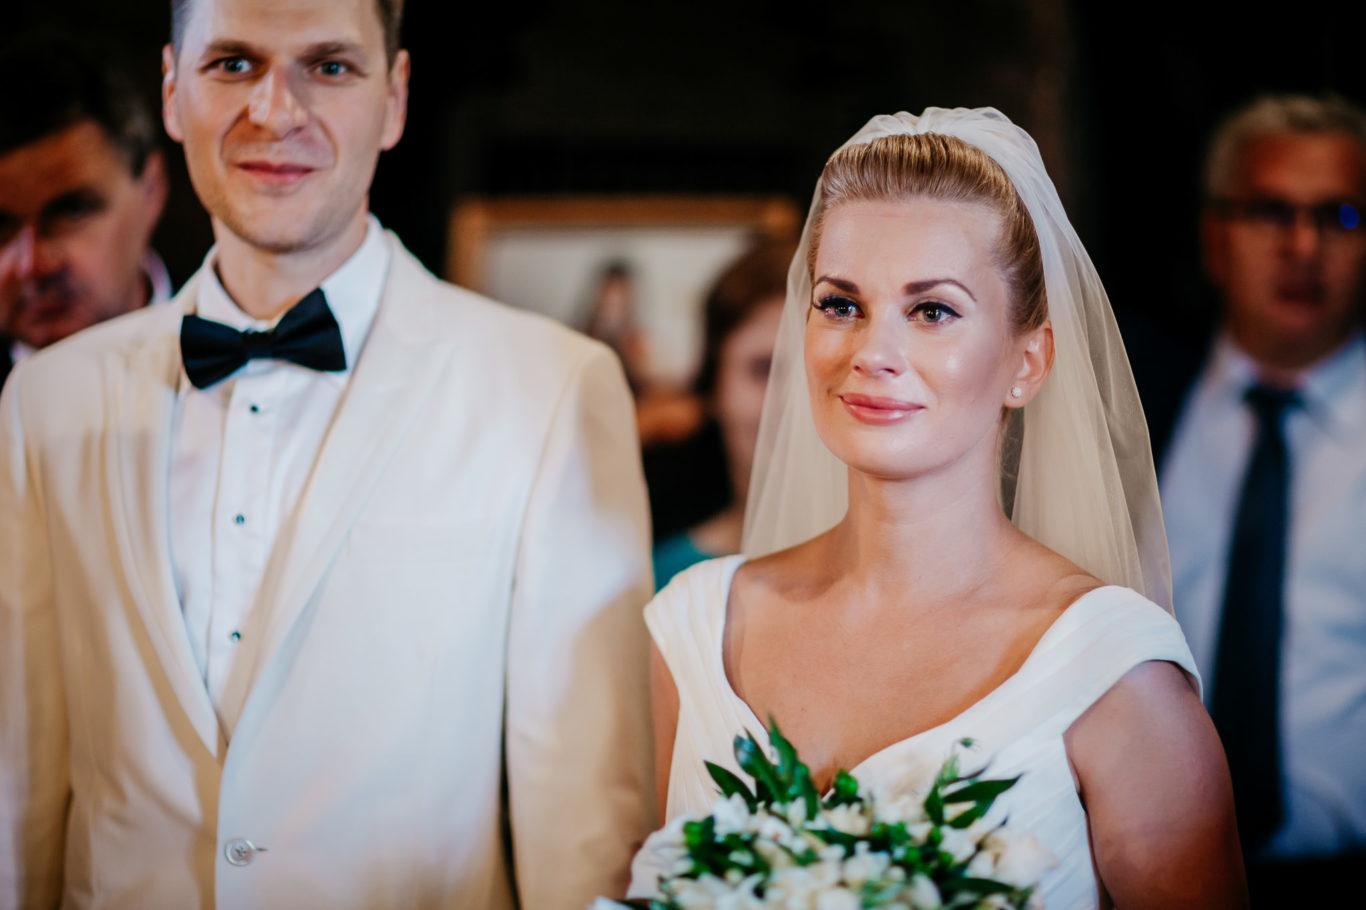 0363-fotoreportaj-nunta-conacul-maldar-cristina-stefan-fotograf-ciprian-dumitrescu-cd2_3262